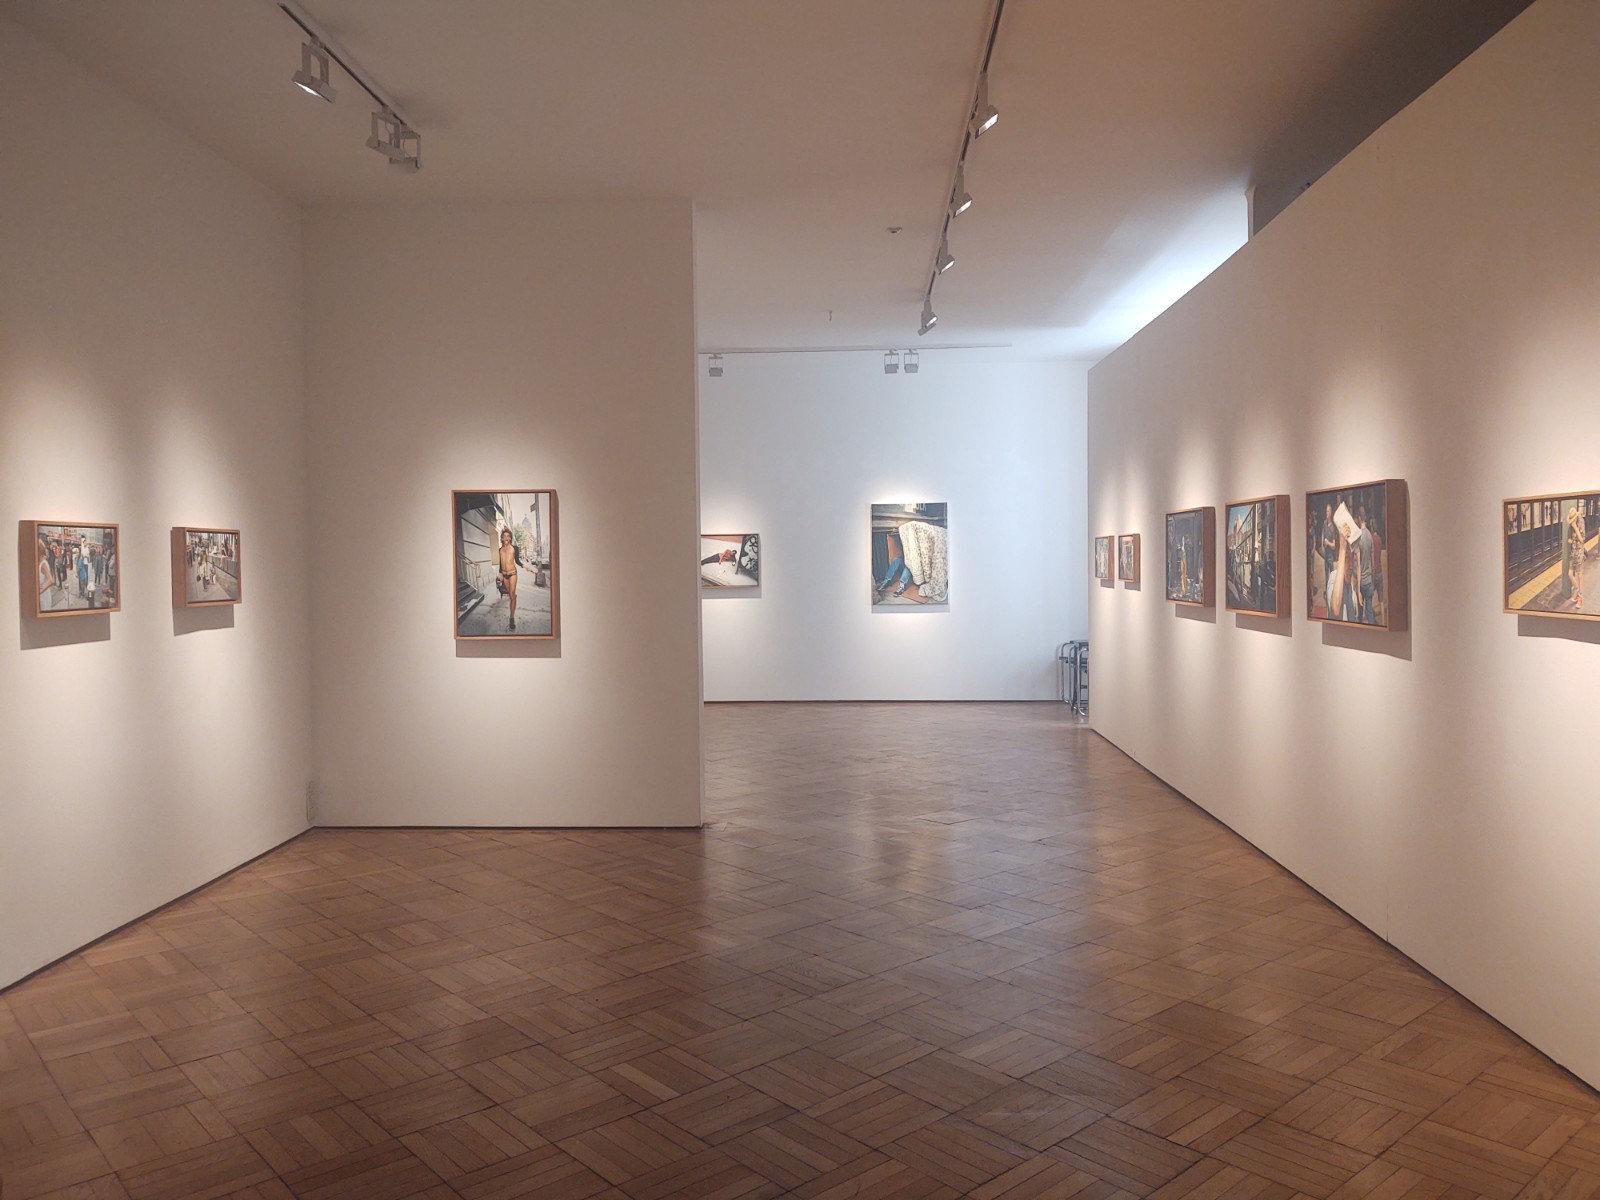 Galerie Ernst Hilger Yigal Ozeri 1